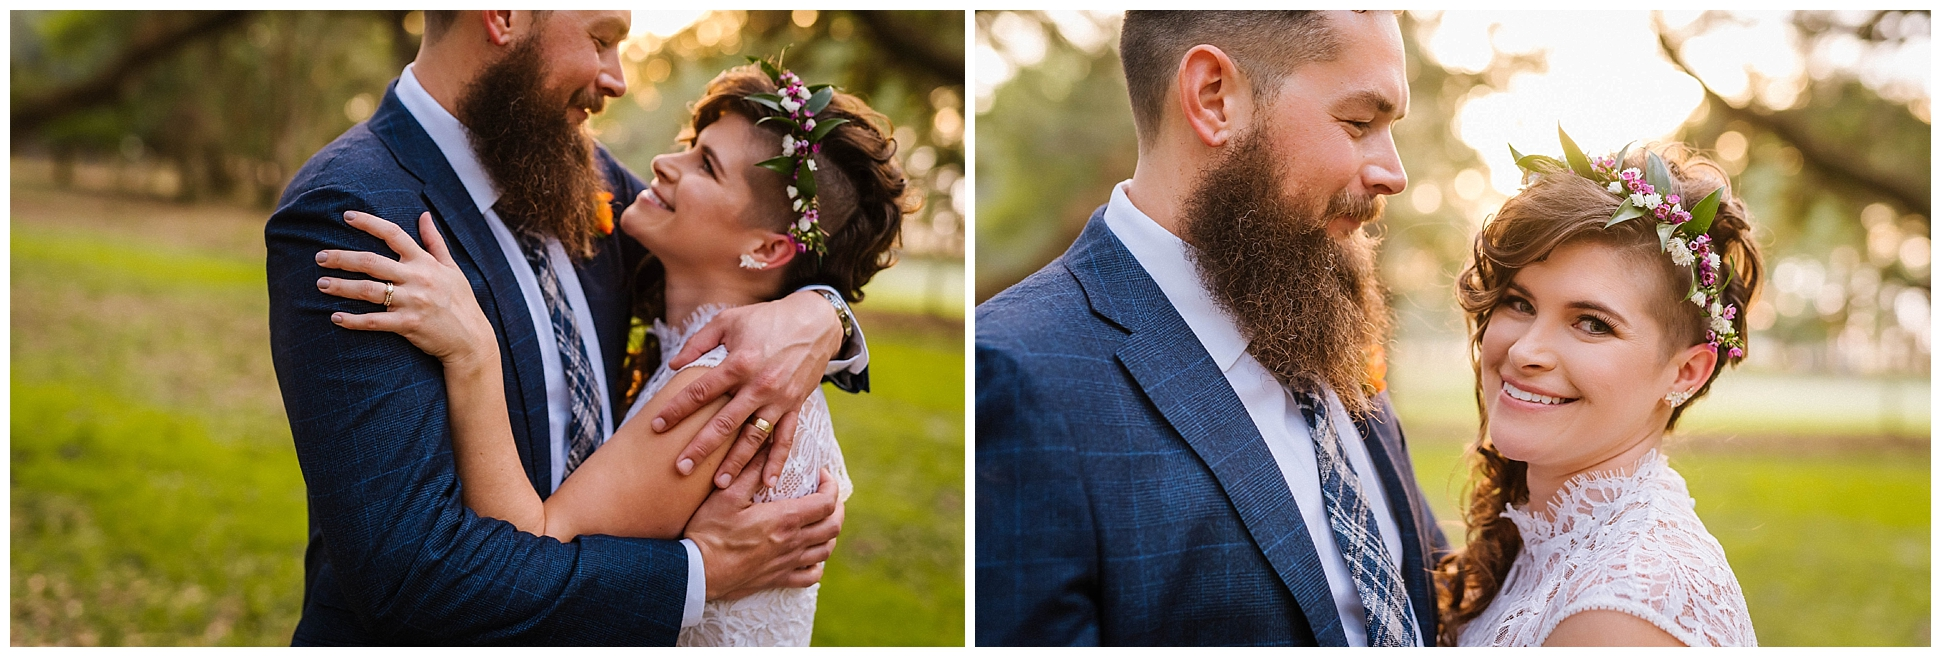 magical-outdoor-florida-wedding-smoke-bombs-flowers-crown-beard_0045.jpg